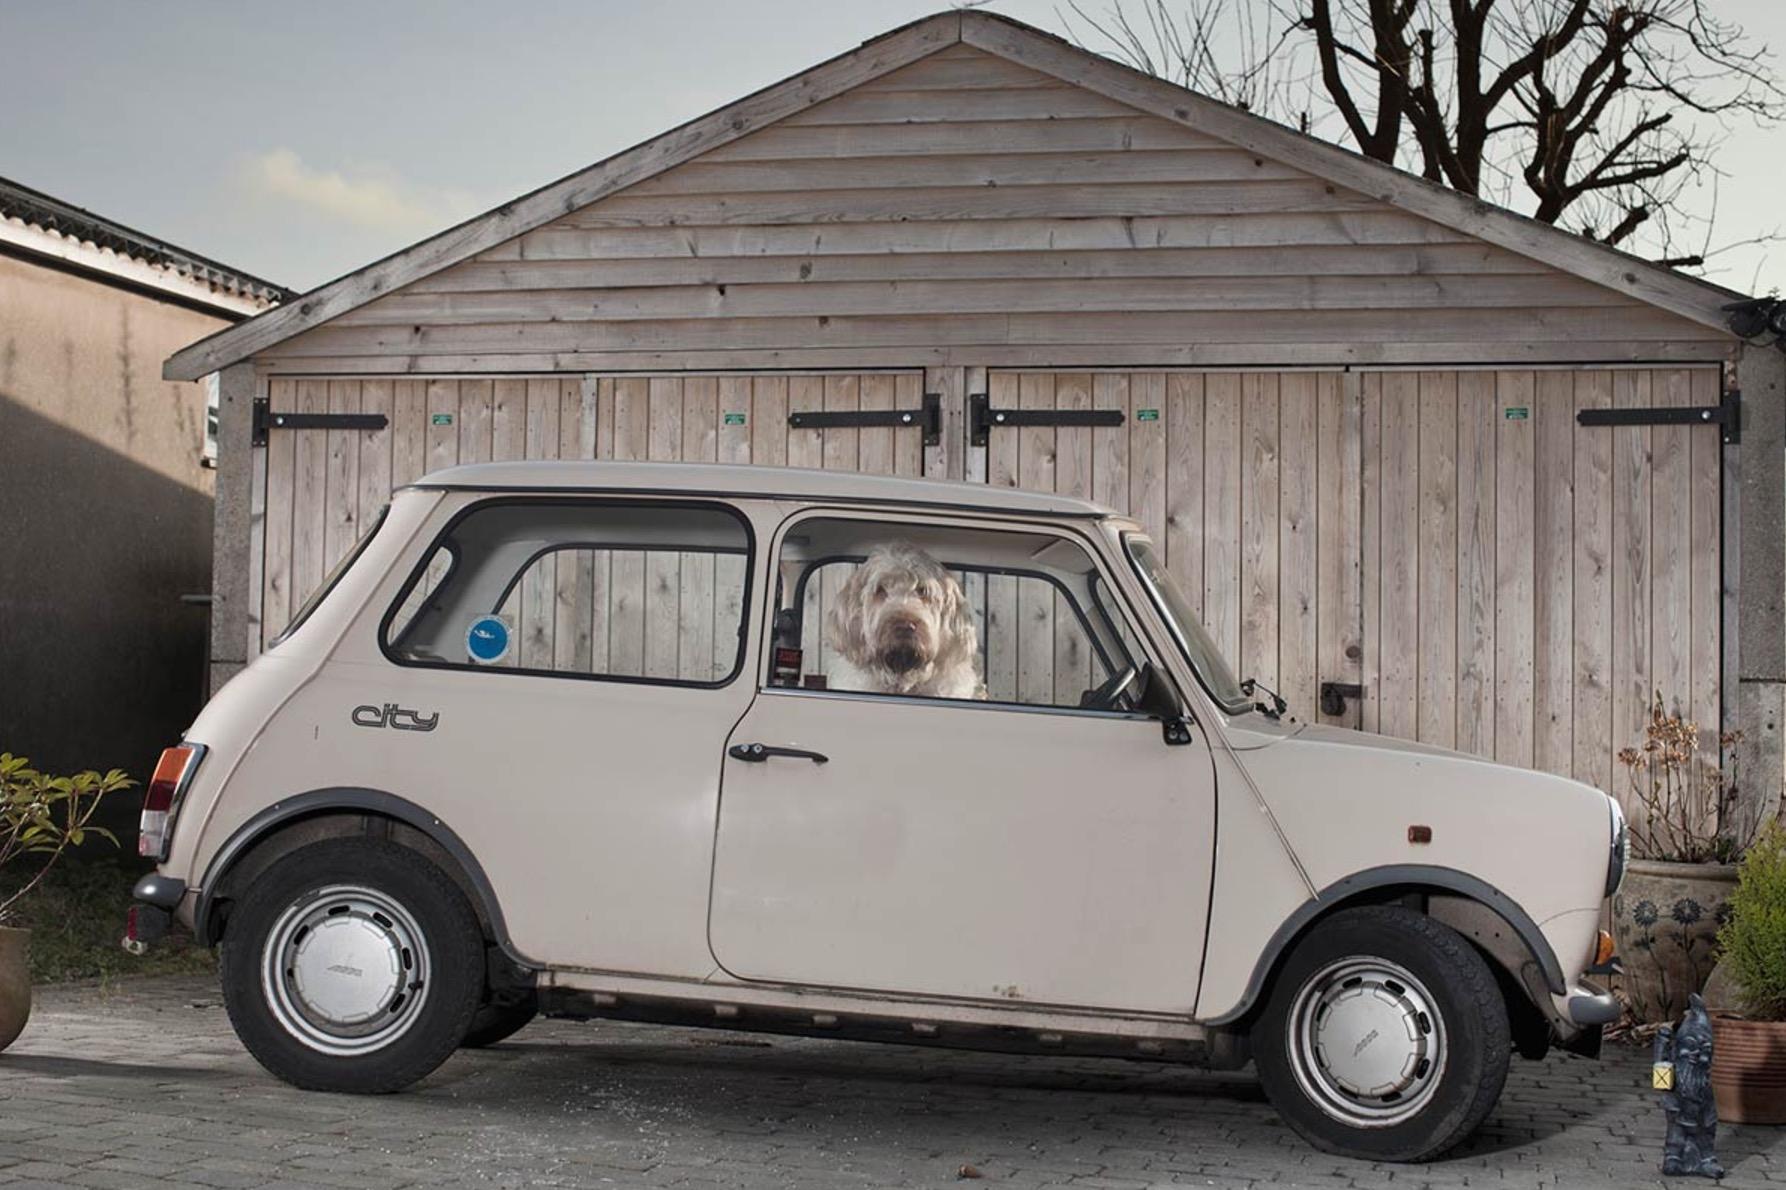 Martin-Usborne-photographe-chiens-voitures-15